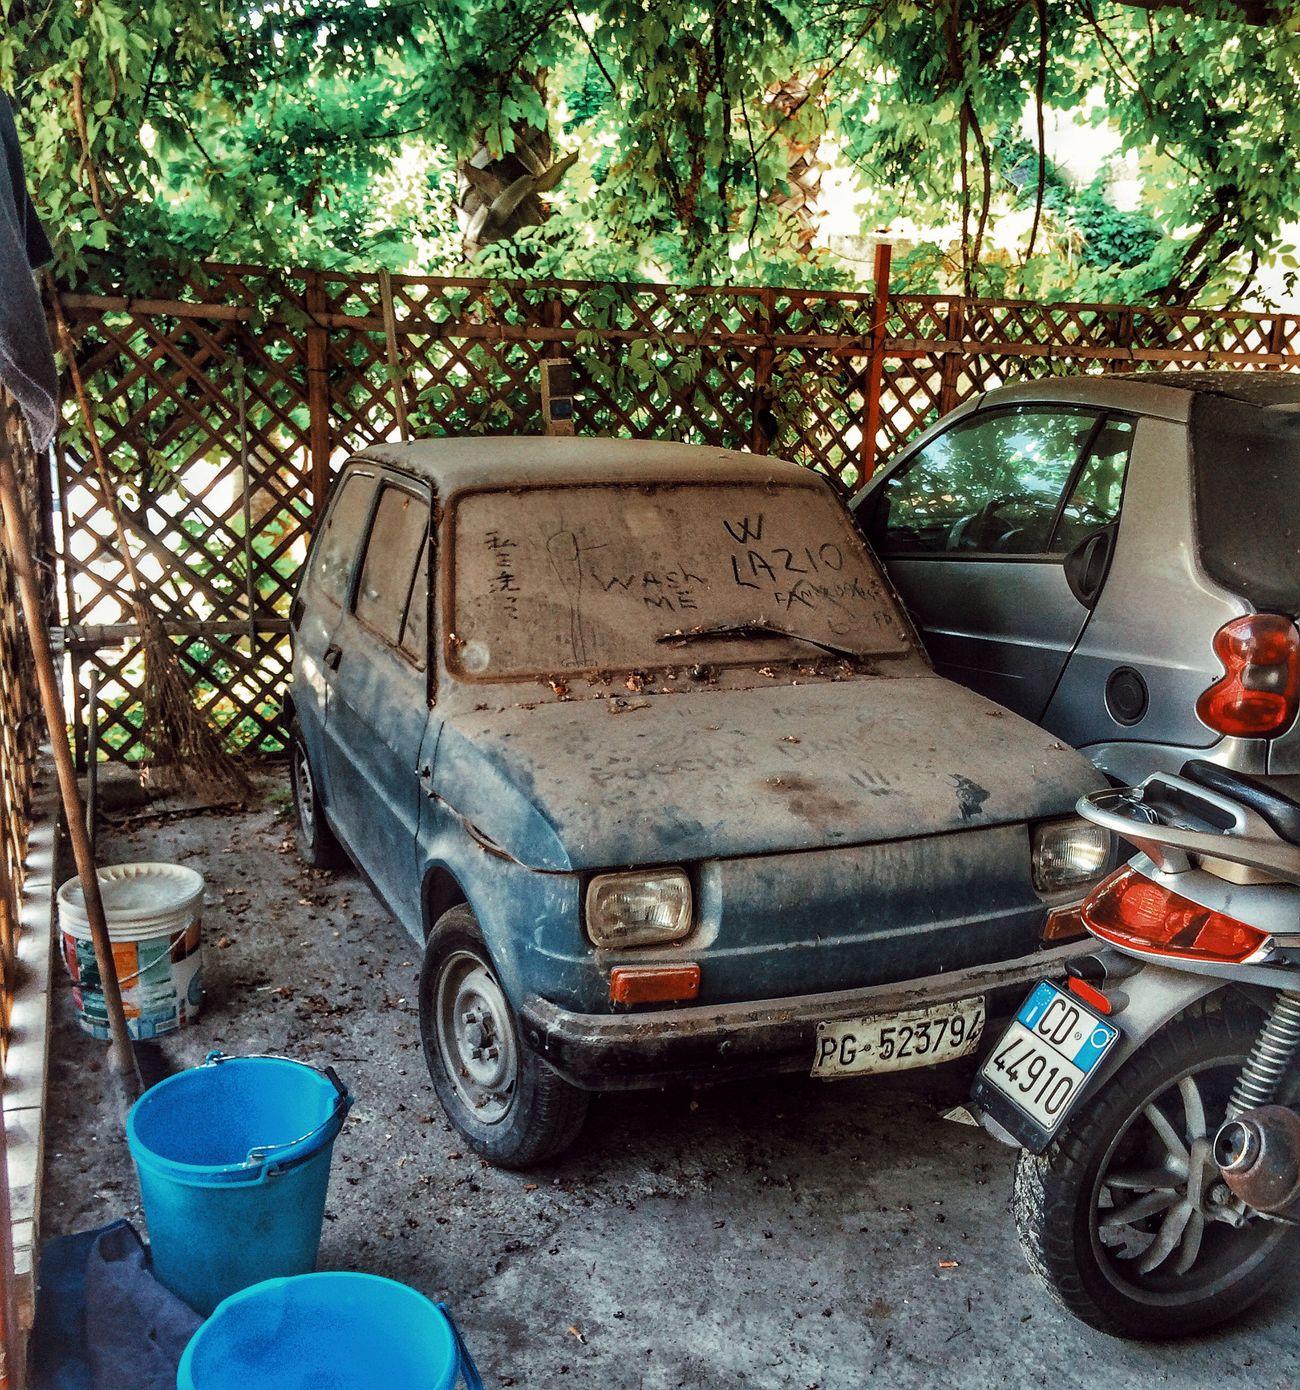 Fiat Bis 500 Fiat500 Transportation Land Vehicle Car Mode Of Transport Obsolete Damaged Vintage Car Abandoned Old-fashioned Run-down Stationary Old Deterioration Rusty Retro Styled Garage Travel Abandoned_junkies